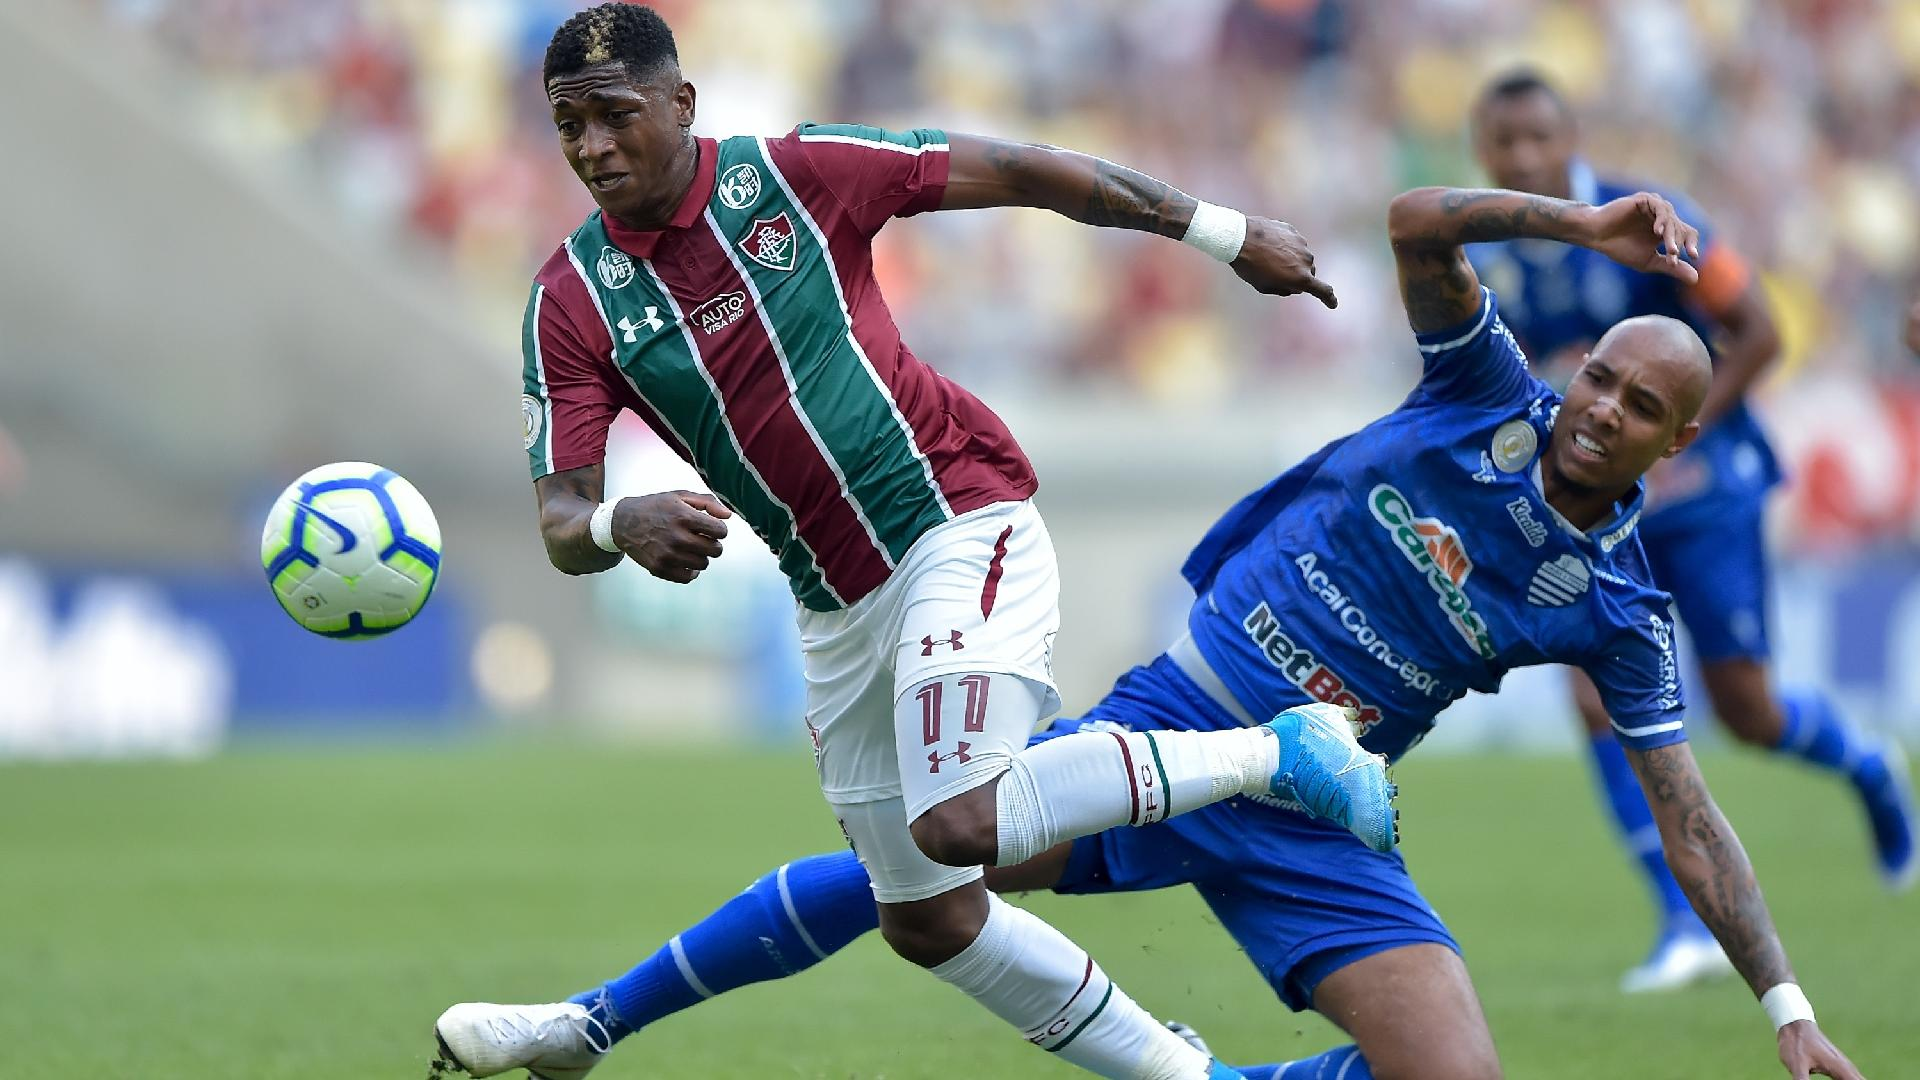 Yony Gonzalez, do Fluminense, disputa a bola com jogador do CSA